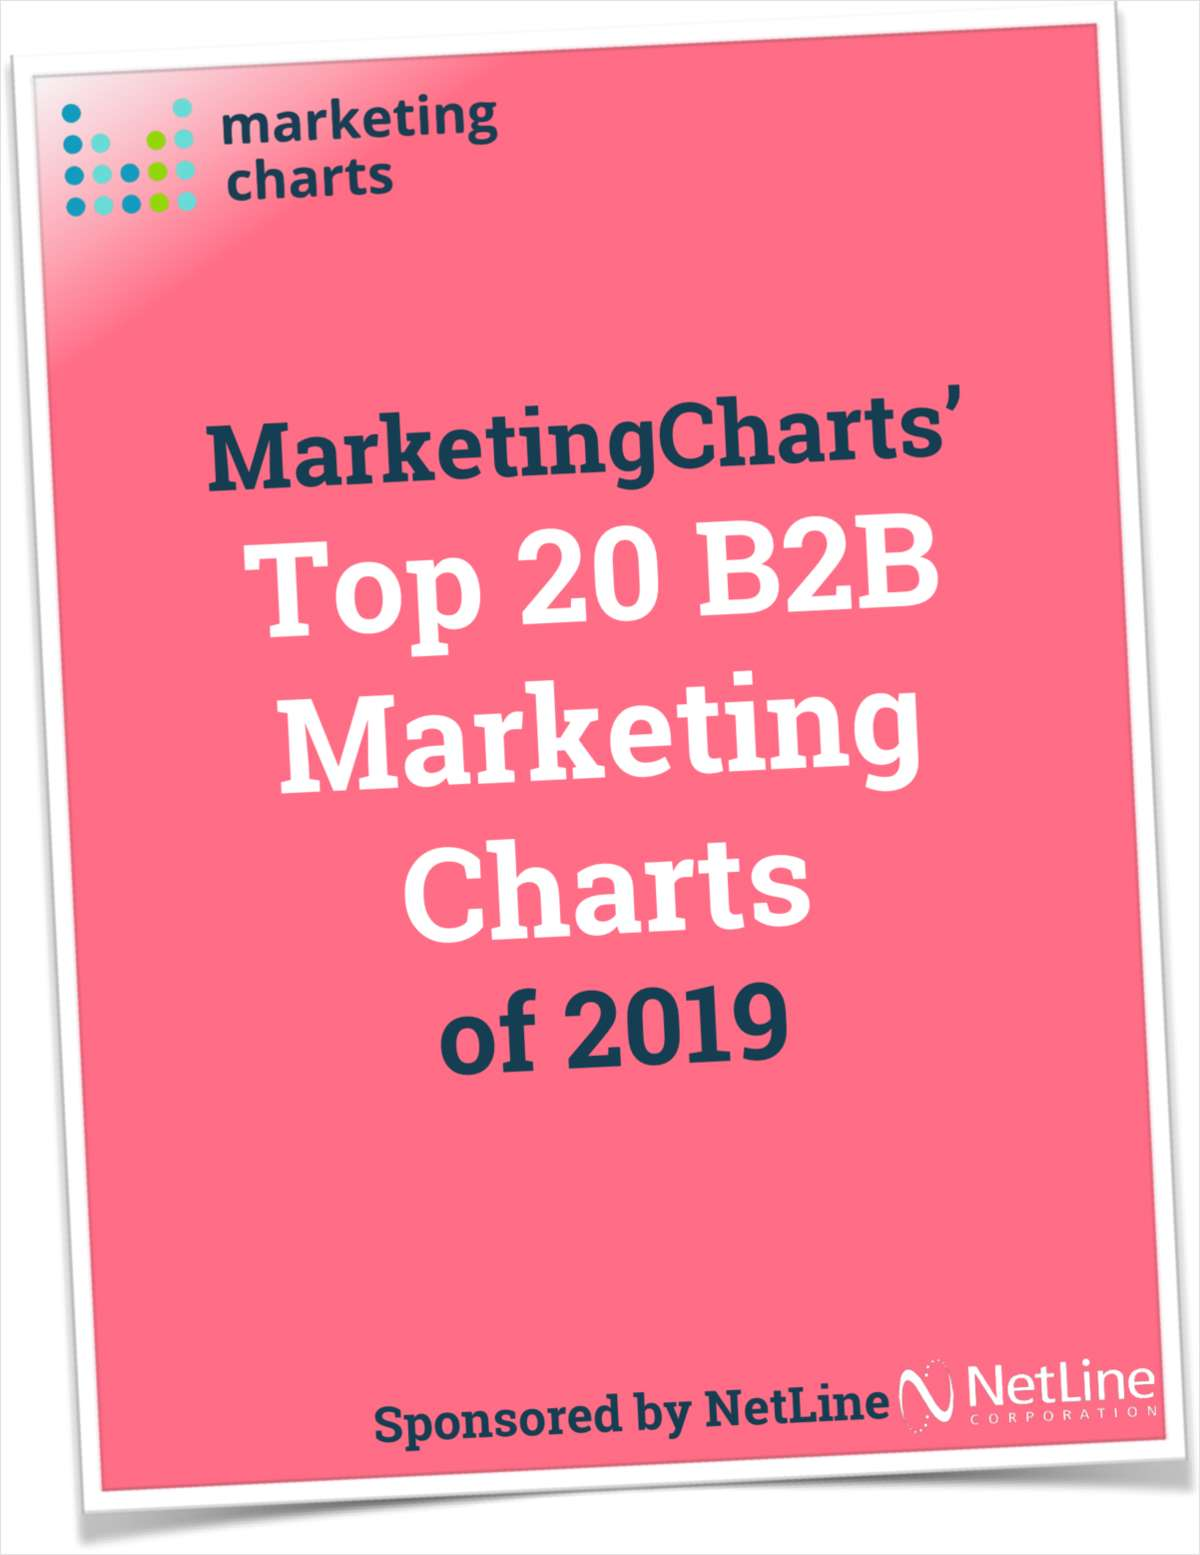 Top 20 B2B Marketing Charts of 2019